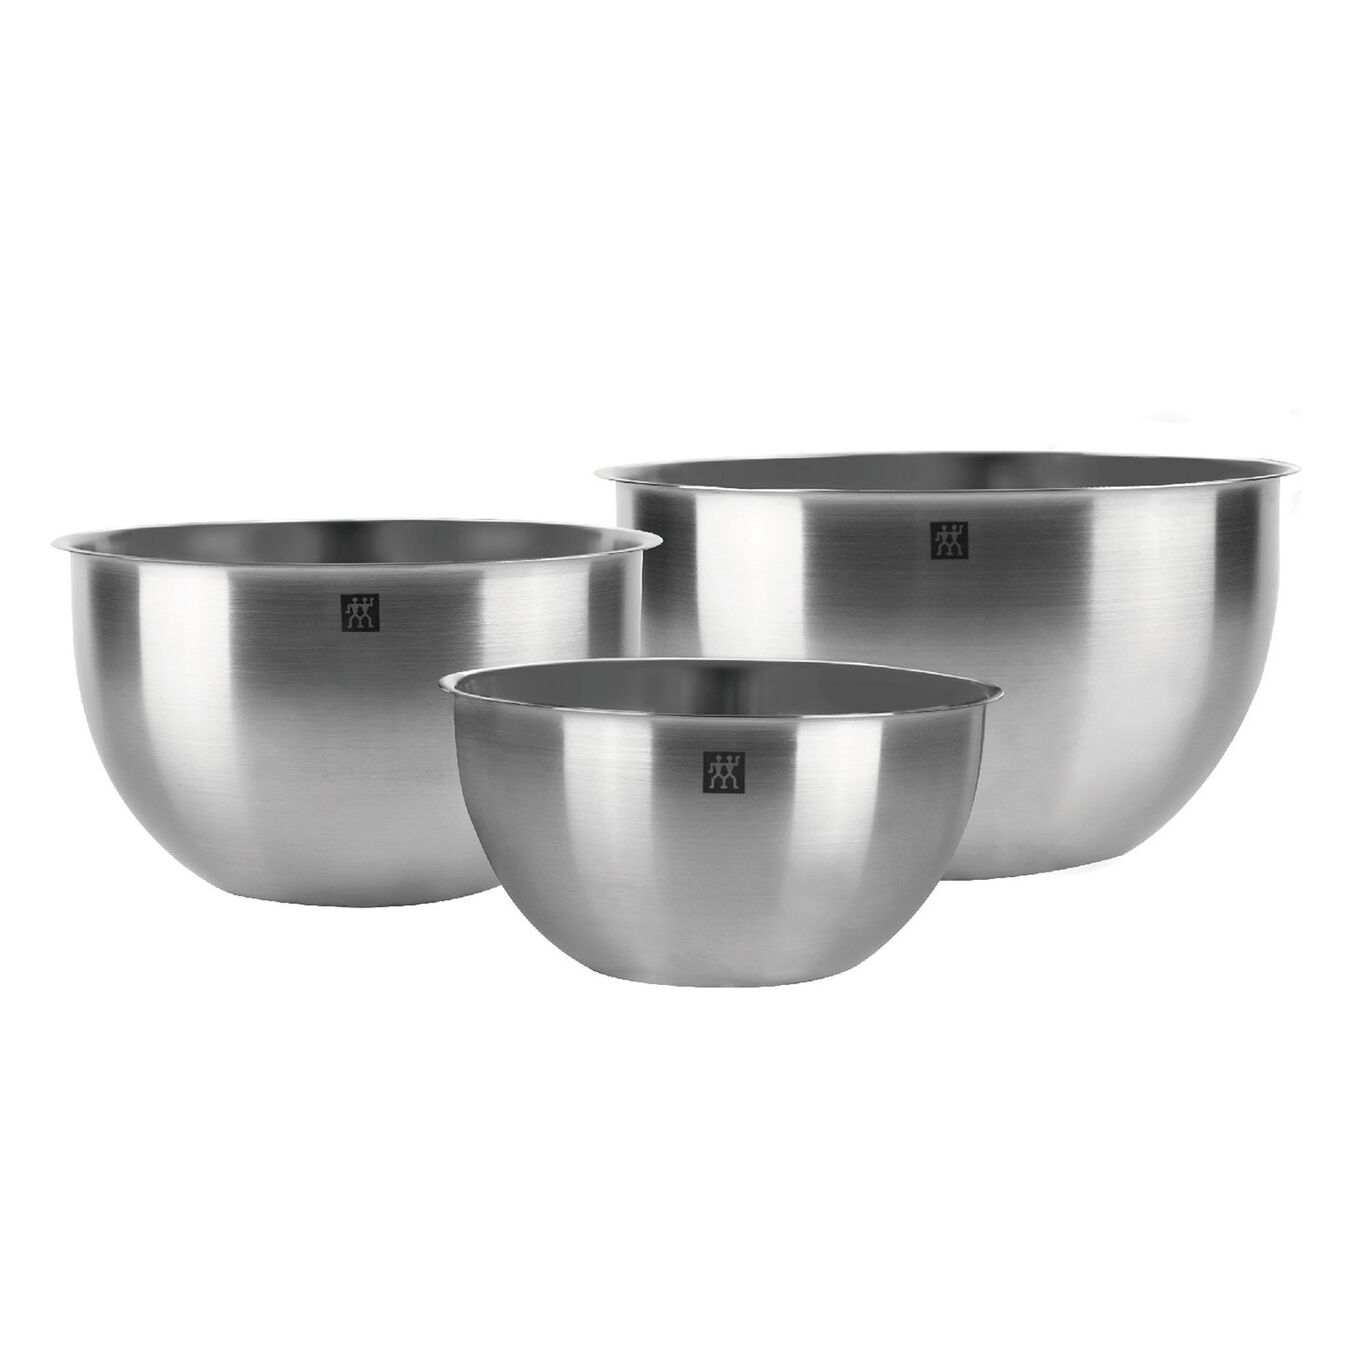 3 Piece Kitchen gadgets sets, silver,,large 1